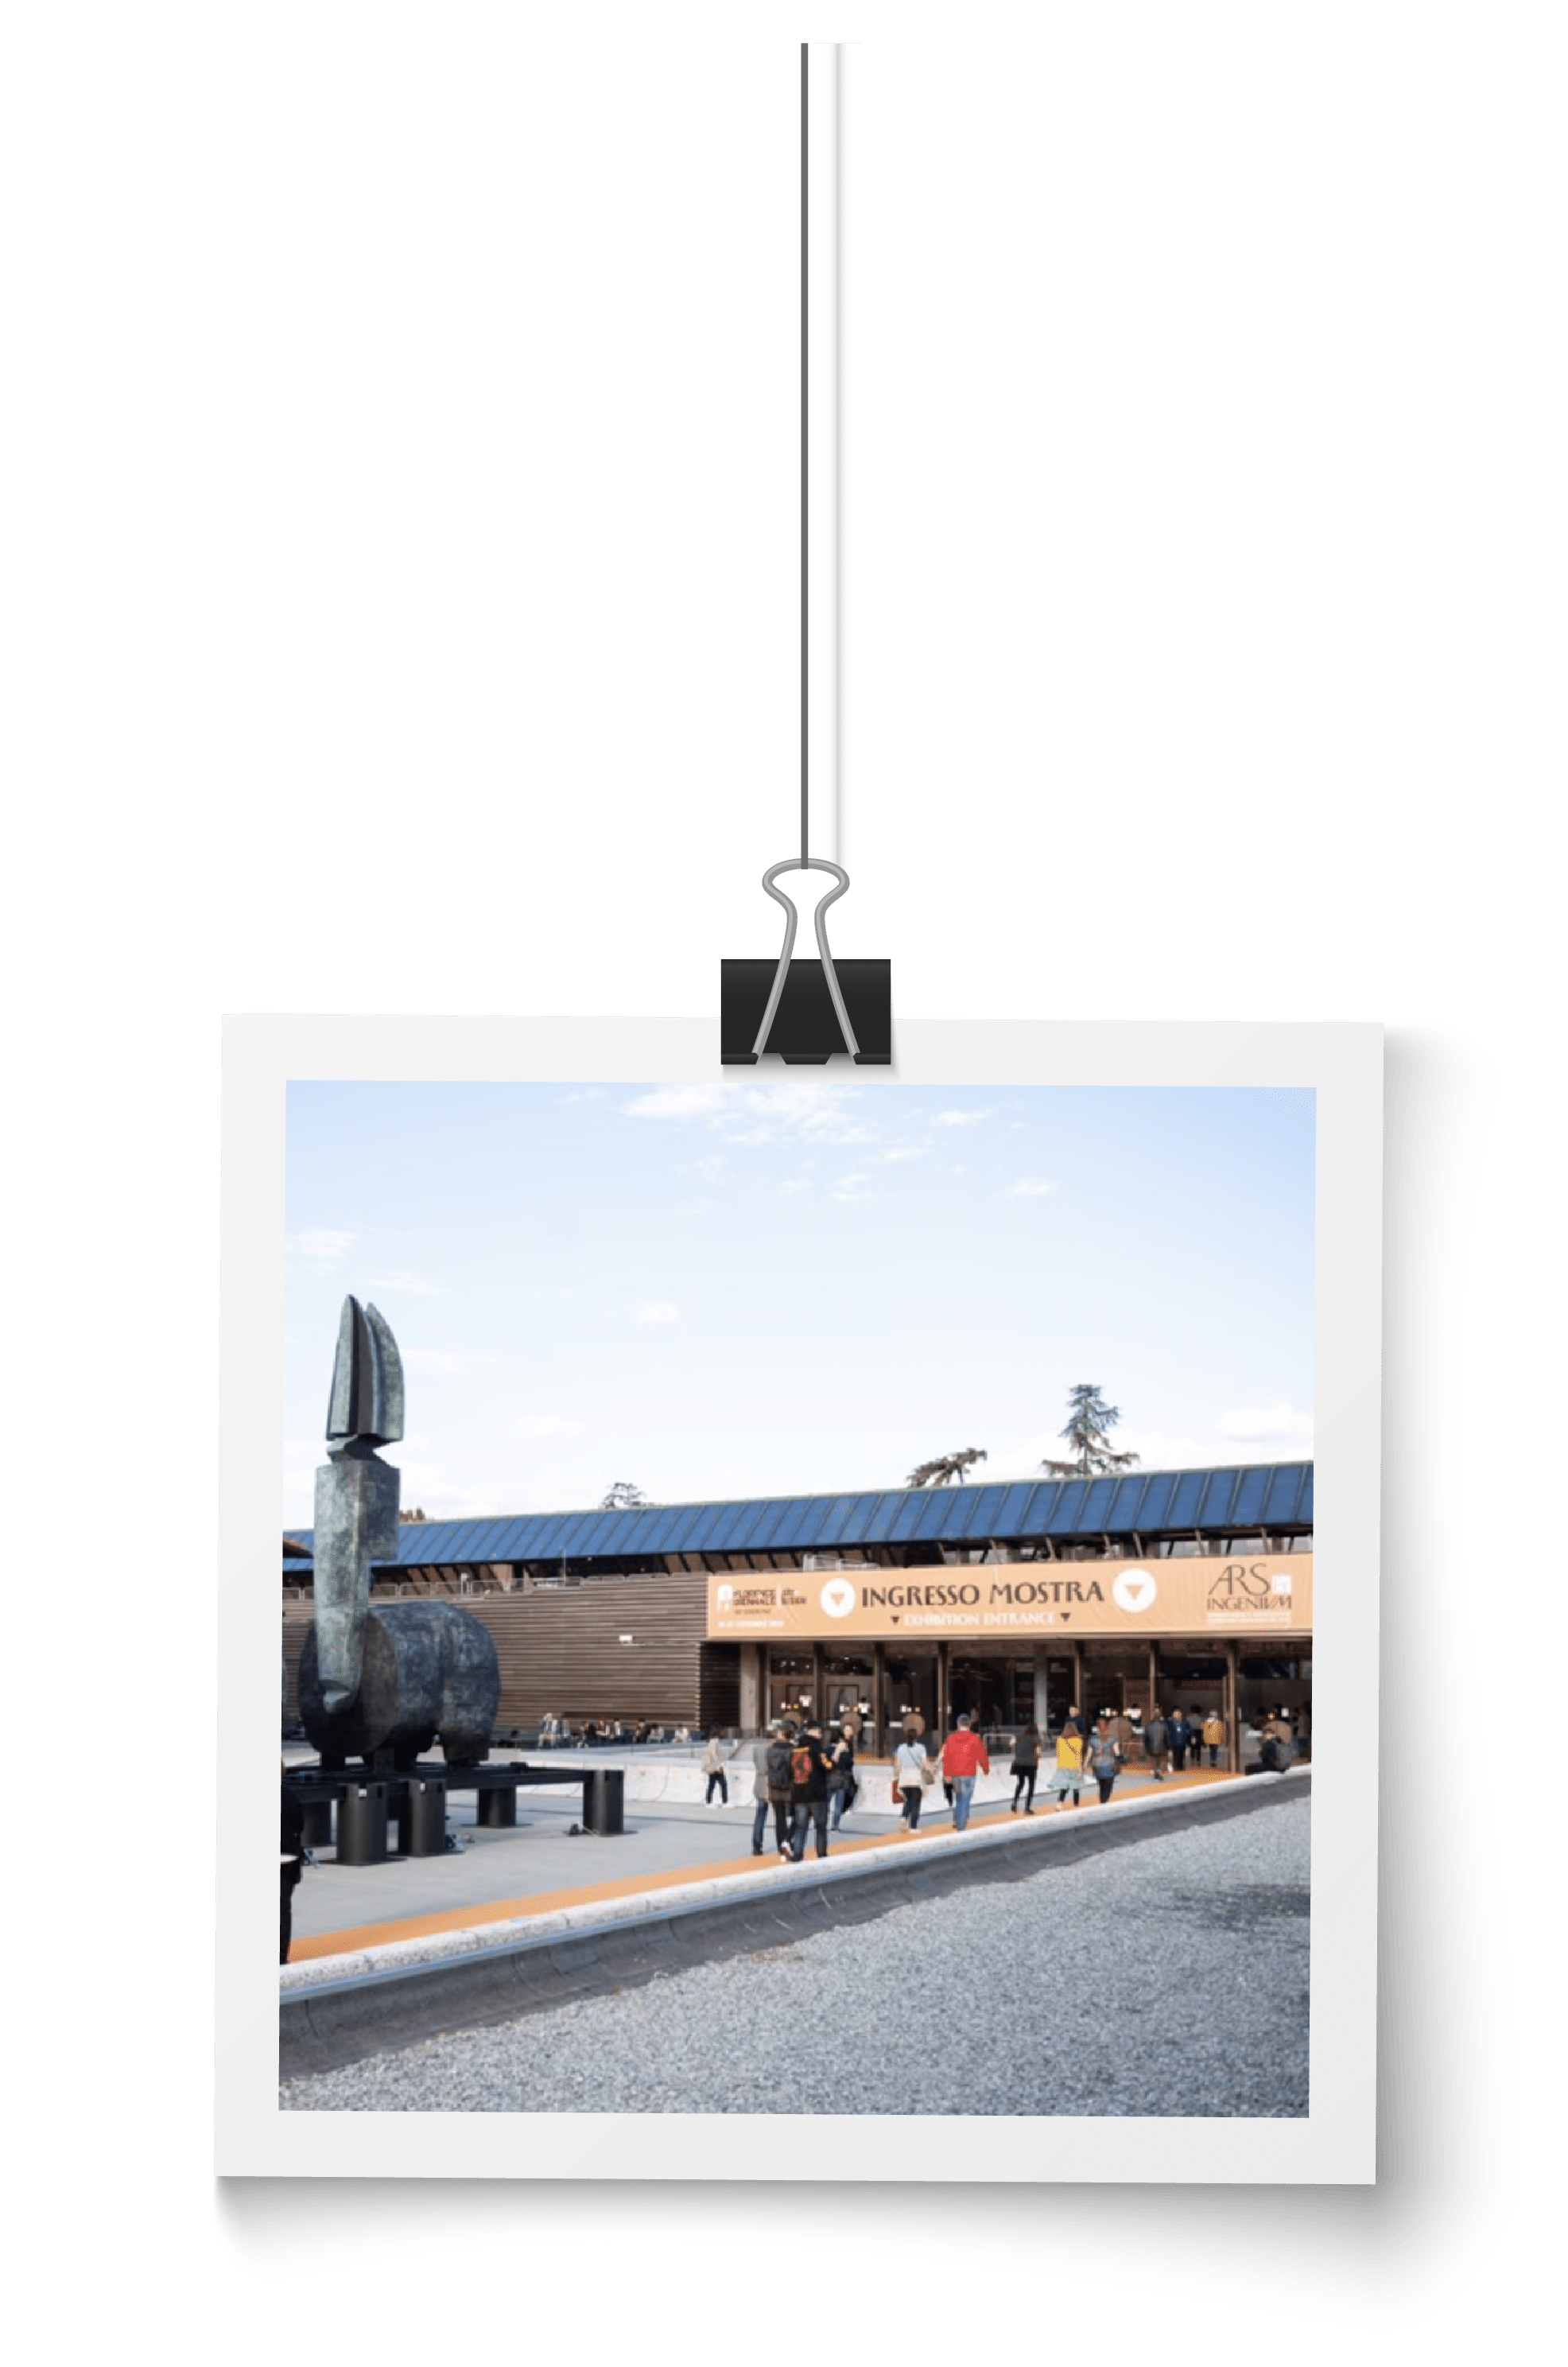 04-TEE-20-CONTEST BIENNALE-GIUGNO 2021-08